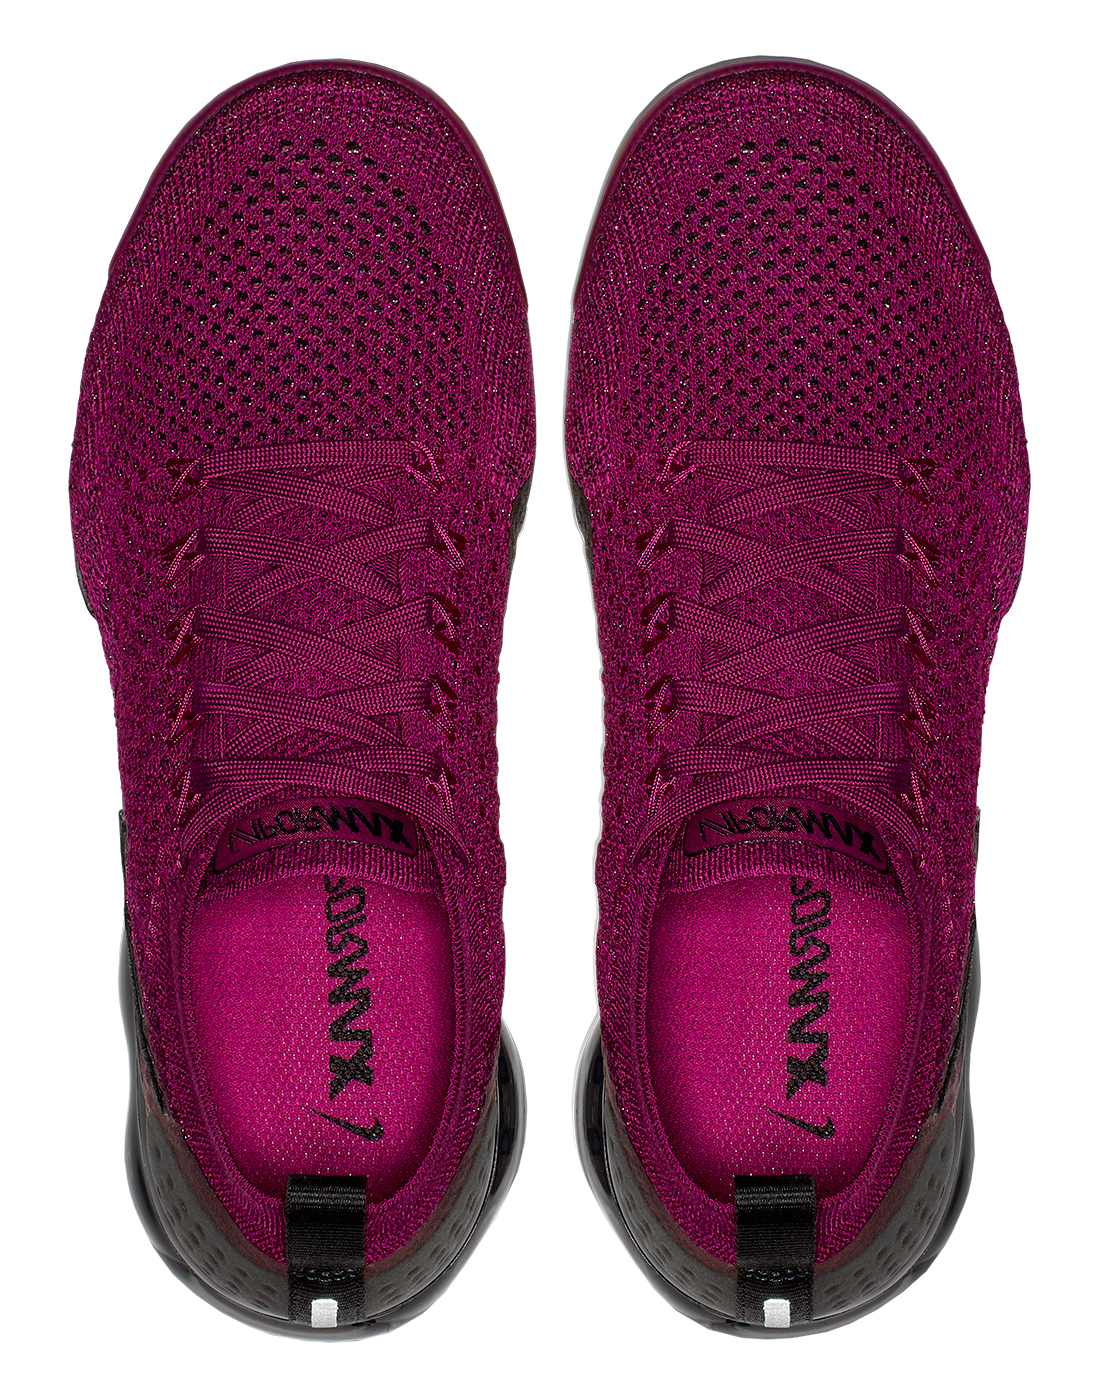 Women's Burgundy Nike Vapormax Flyknit